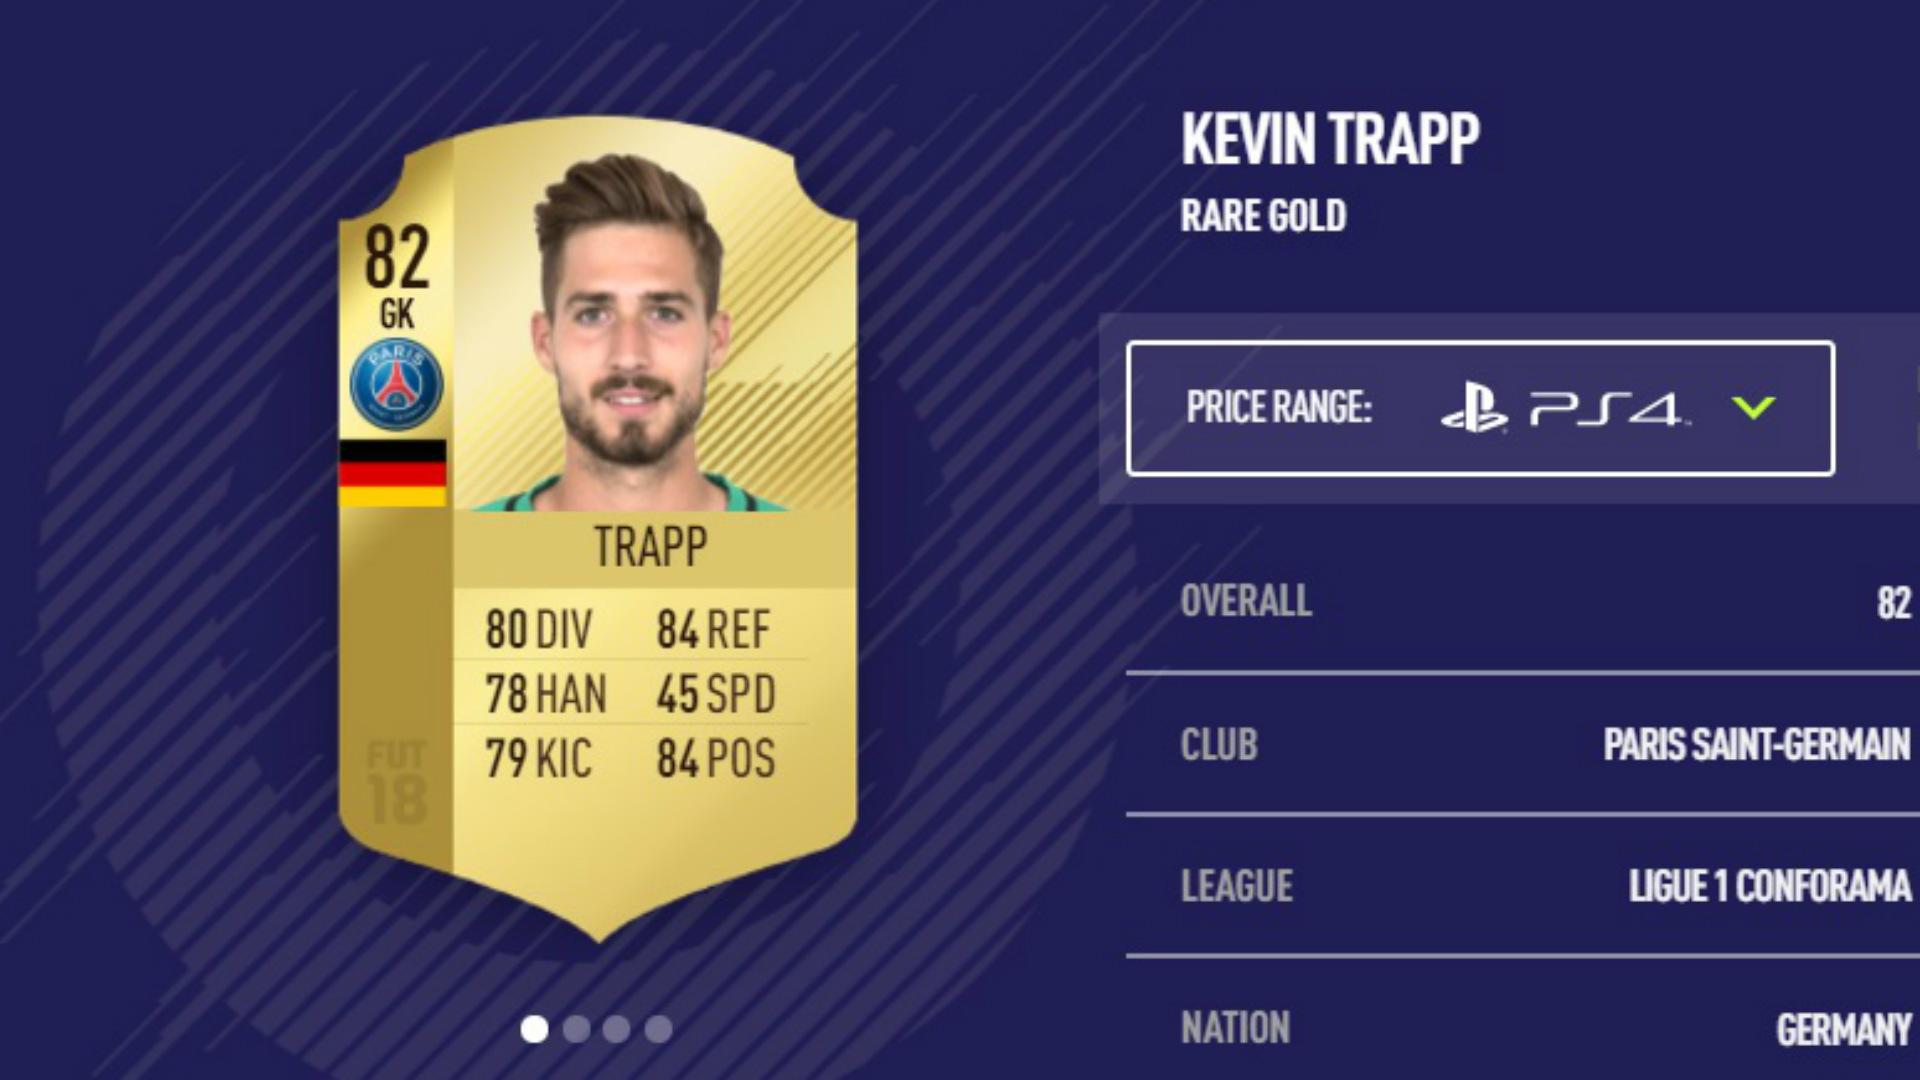 FIFA 18 Kevin Trapp